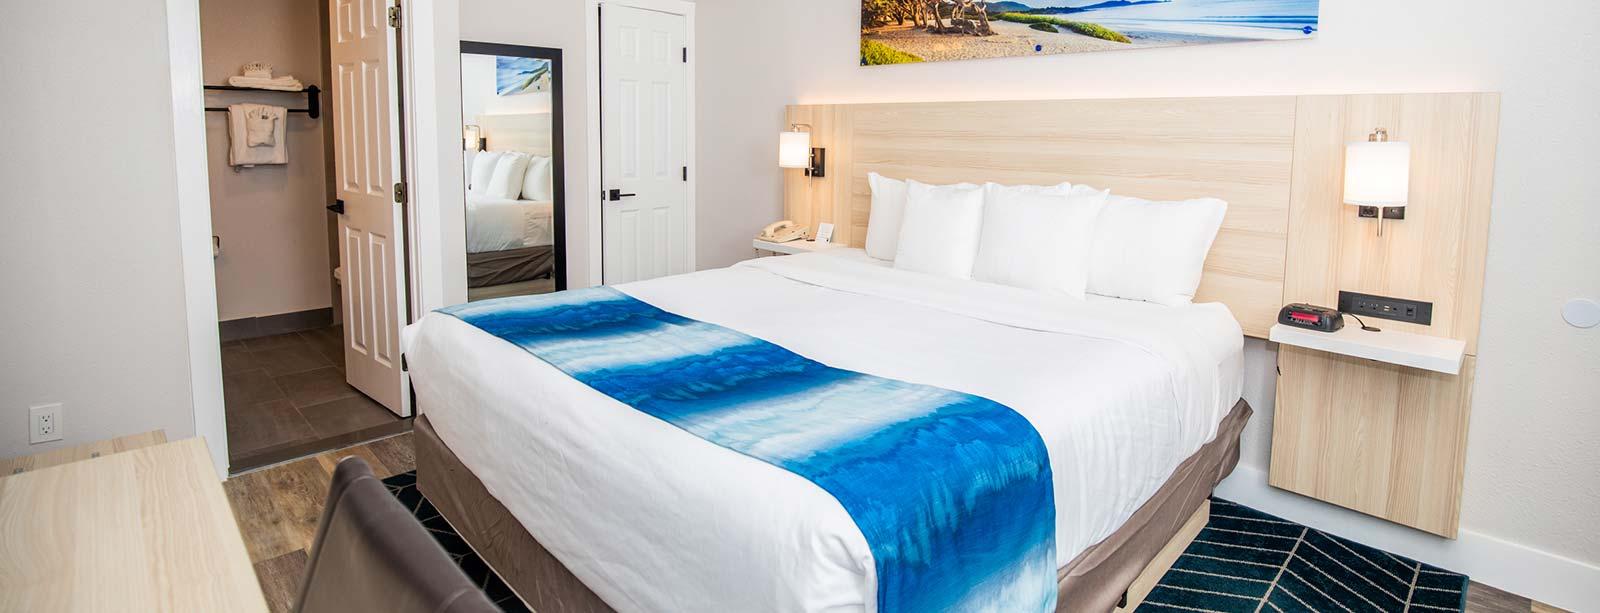 Comfort Inn Carmel by the Sea California